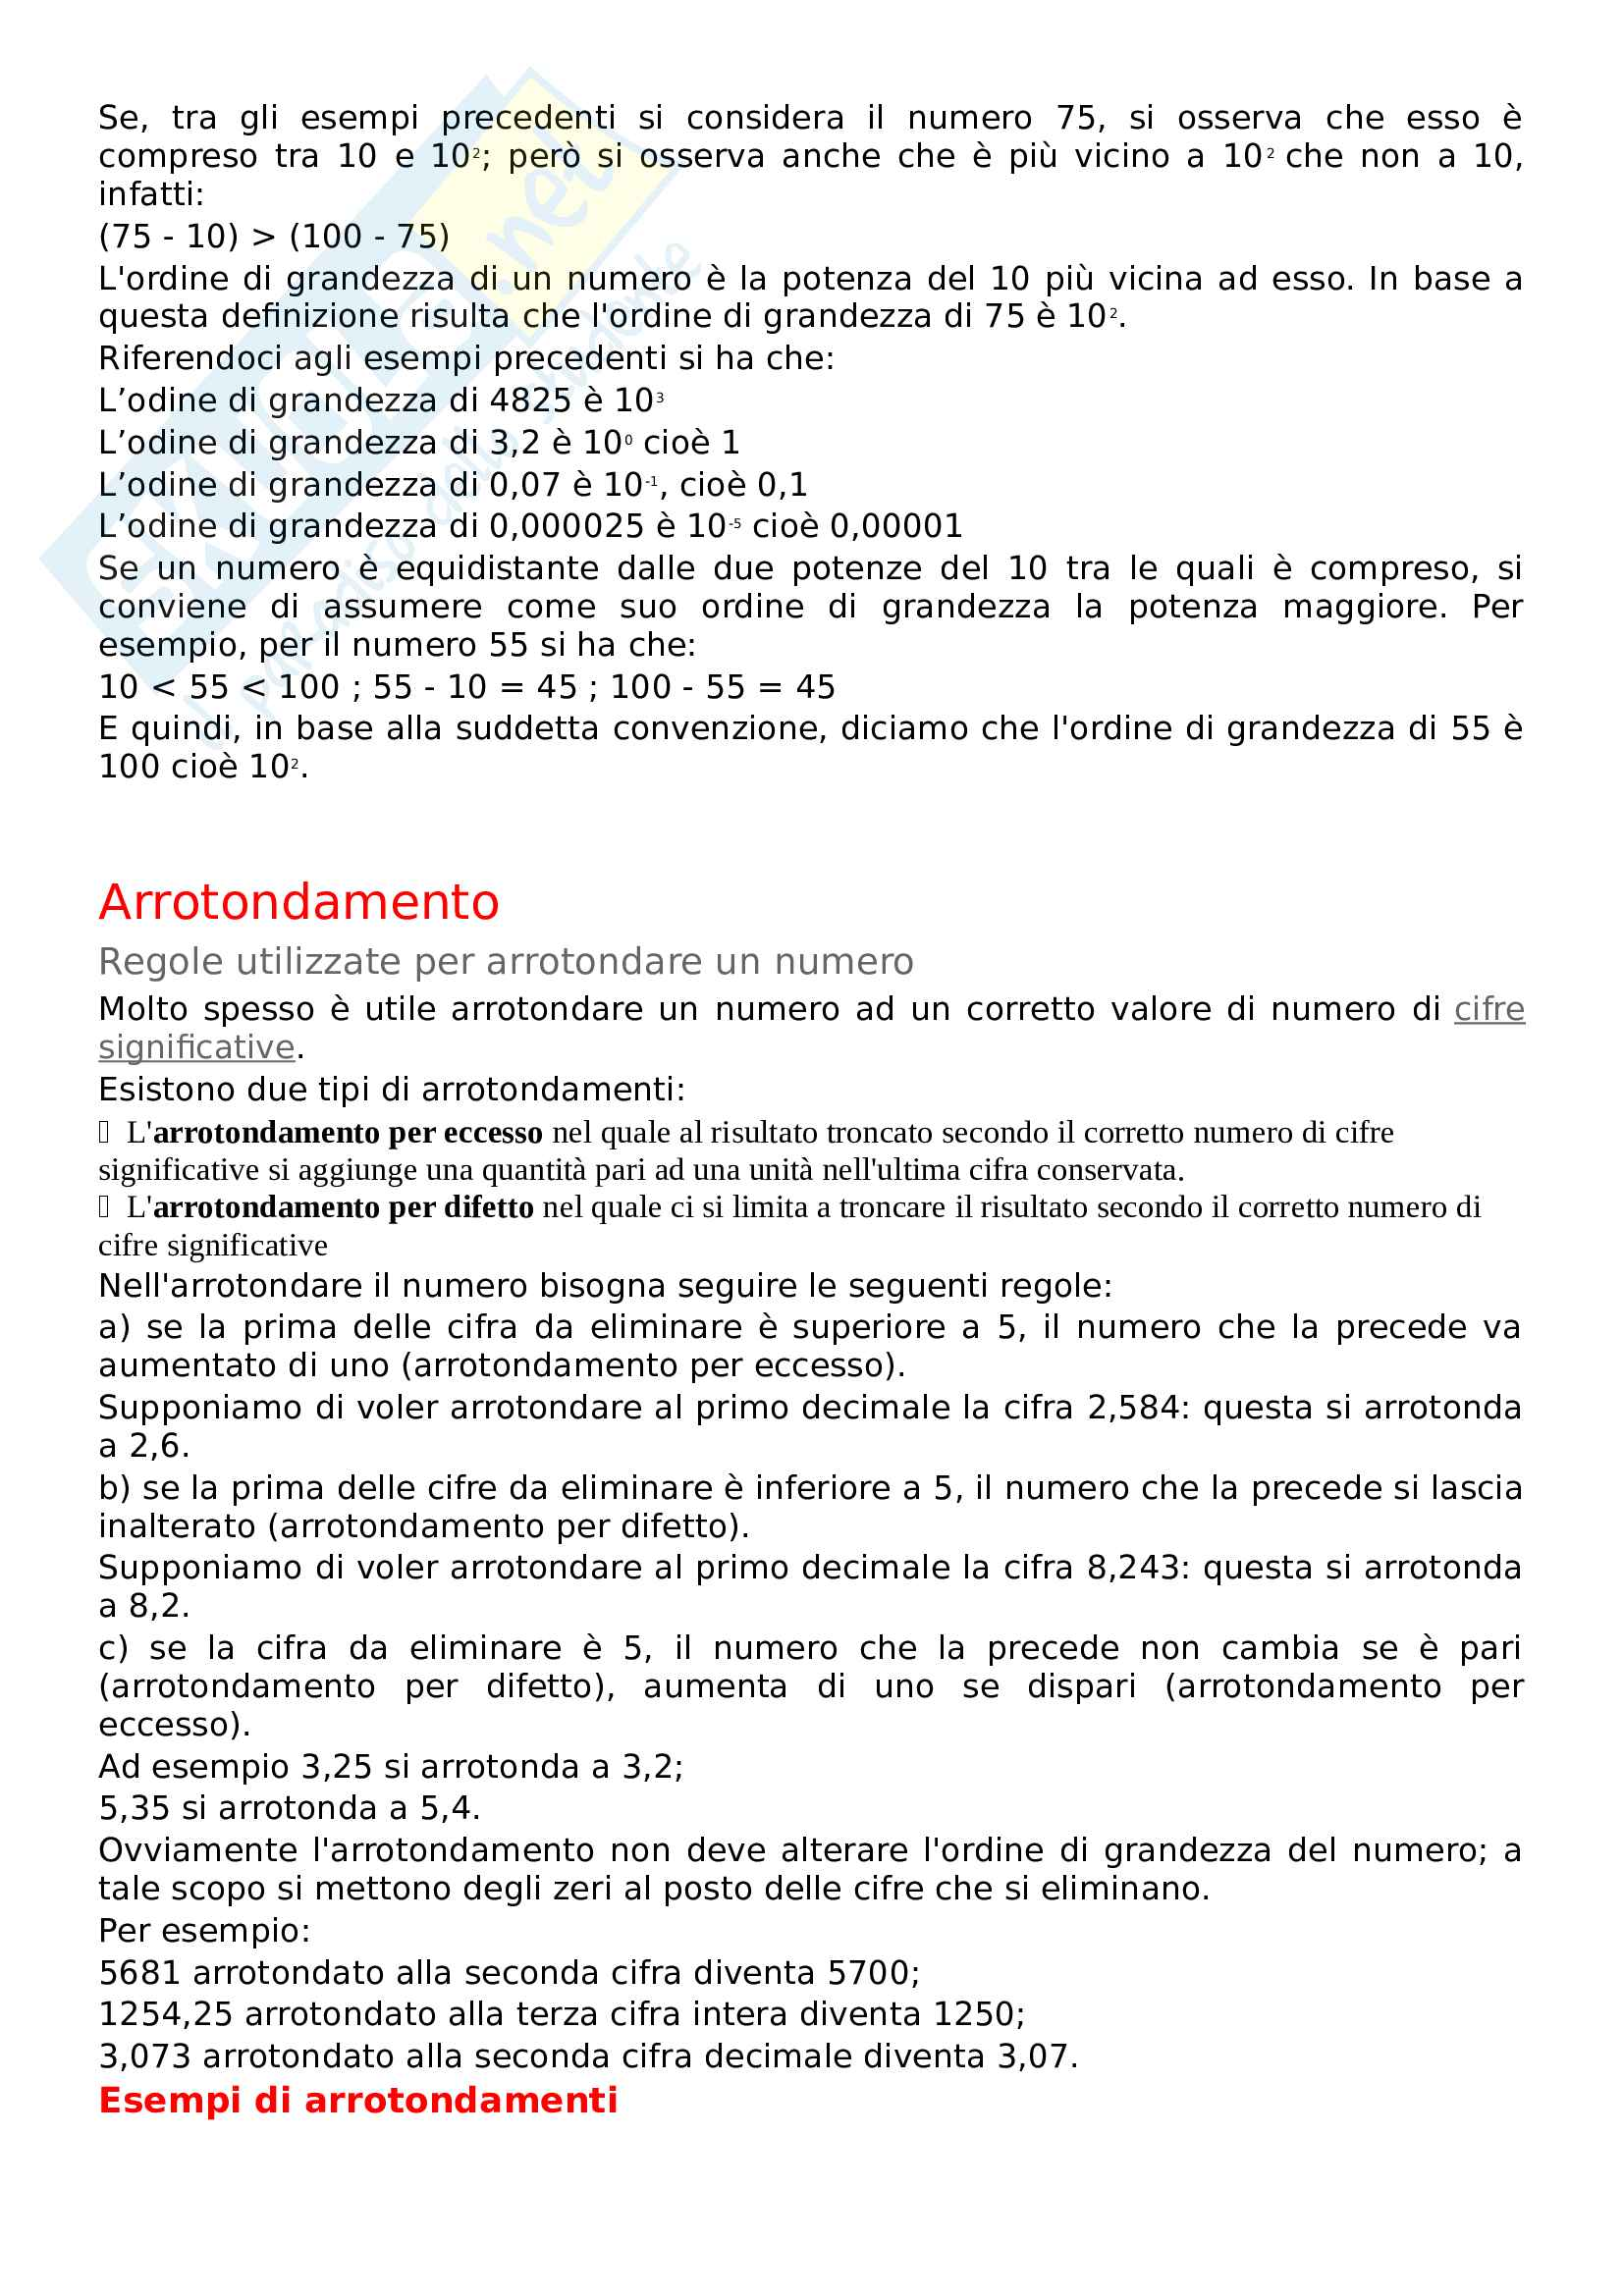 Chimica inorganica Pag. 21